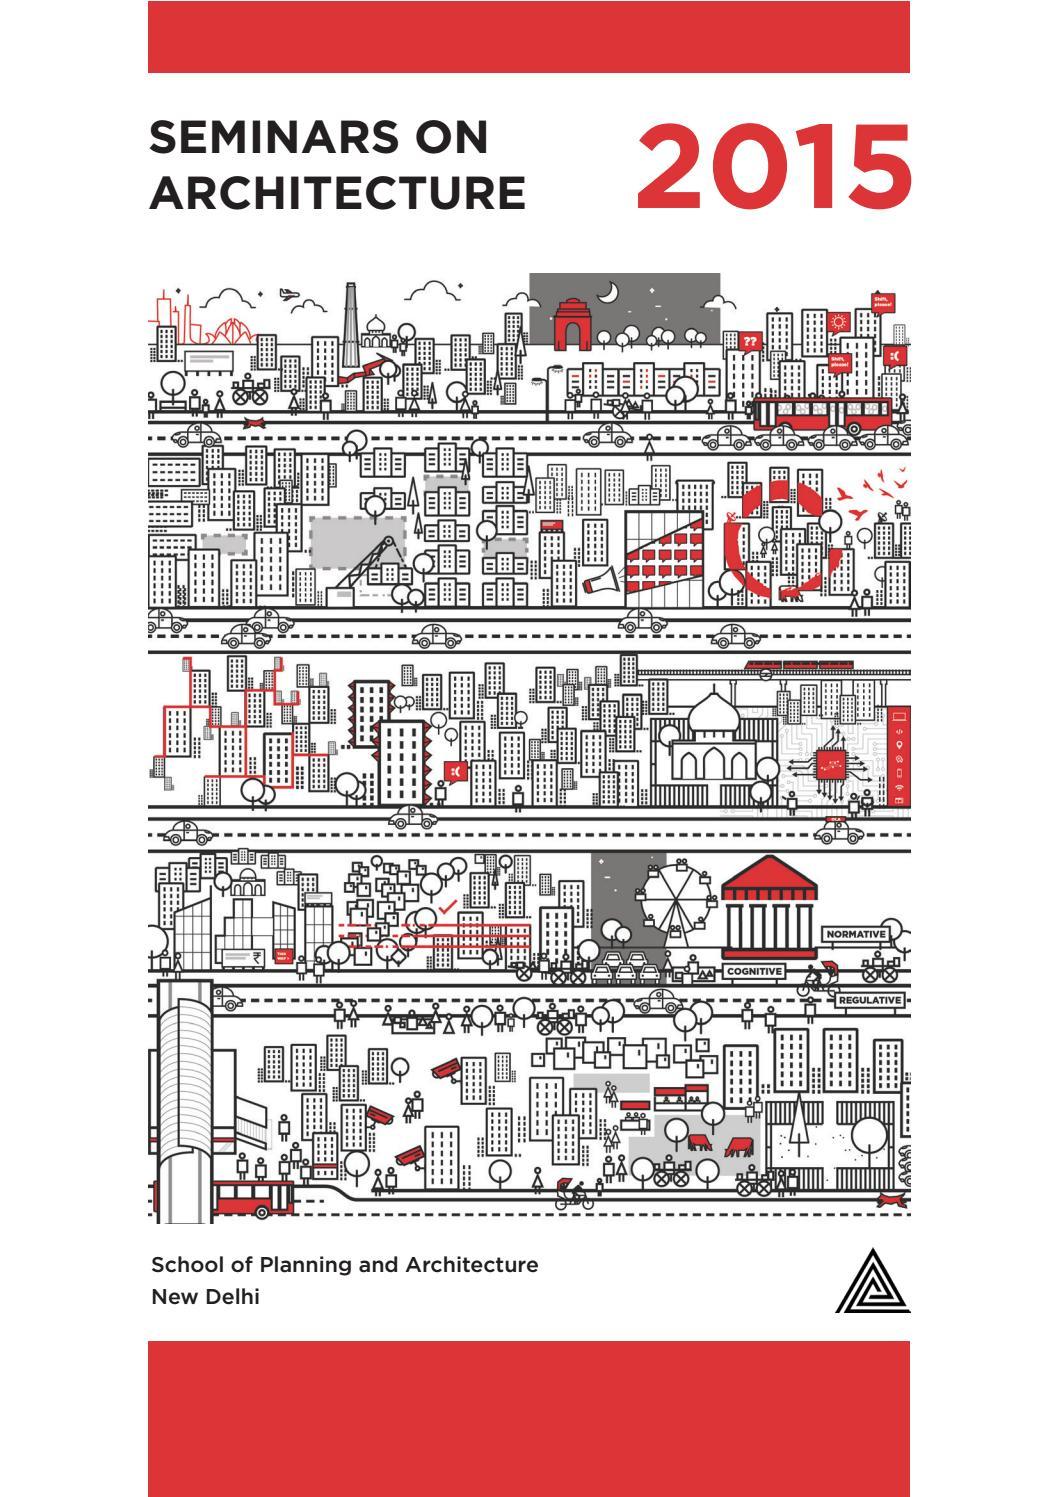 F5 Urbanity: Seminars on Architecture by Nishita Mohta - issuu